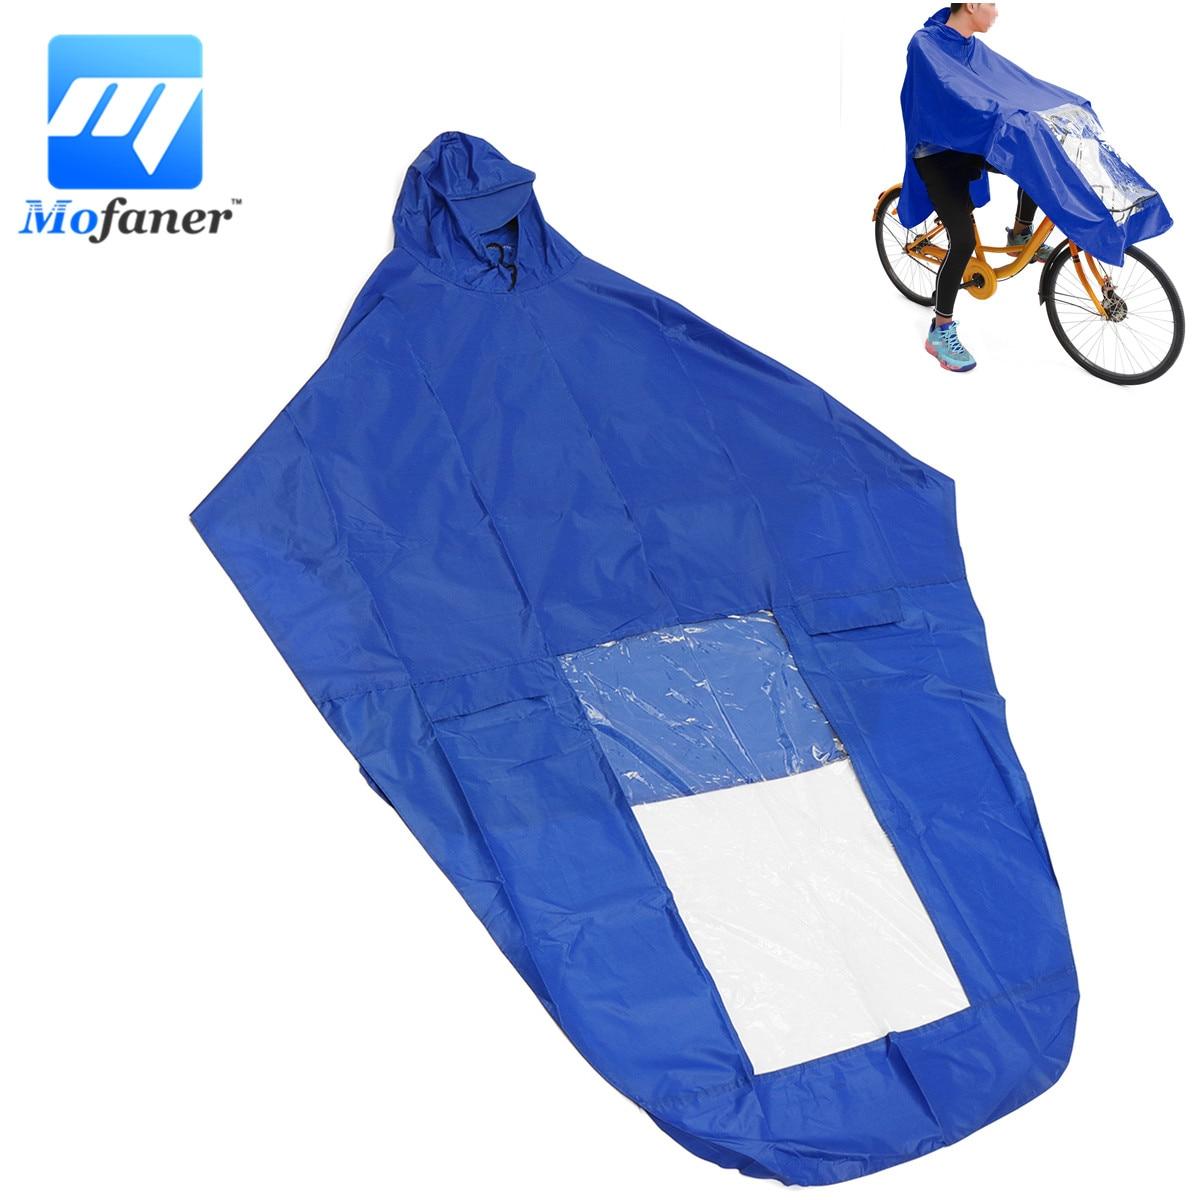 Bule/Red Motorcycle Scooter Raincoat Cover Windproof PVC Motorbike Bike Rider Rain Coat Covers  Waterproof